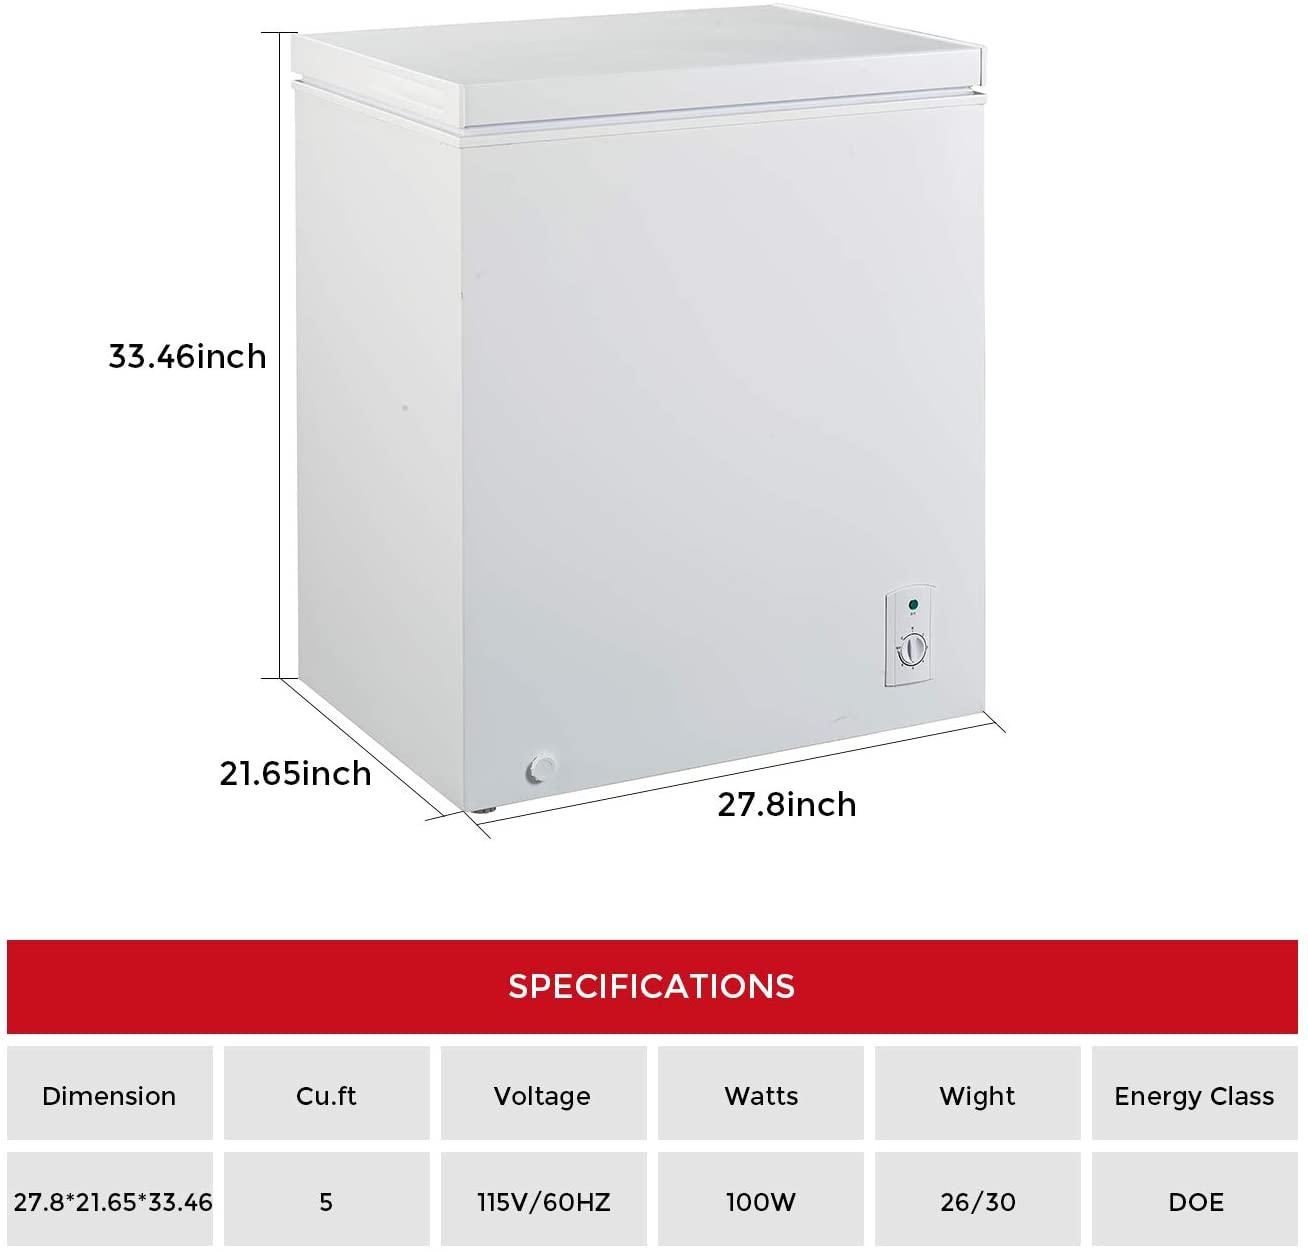 KEG 5.0 Cubic Feet Top Chest Freezer Specs